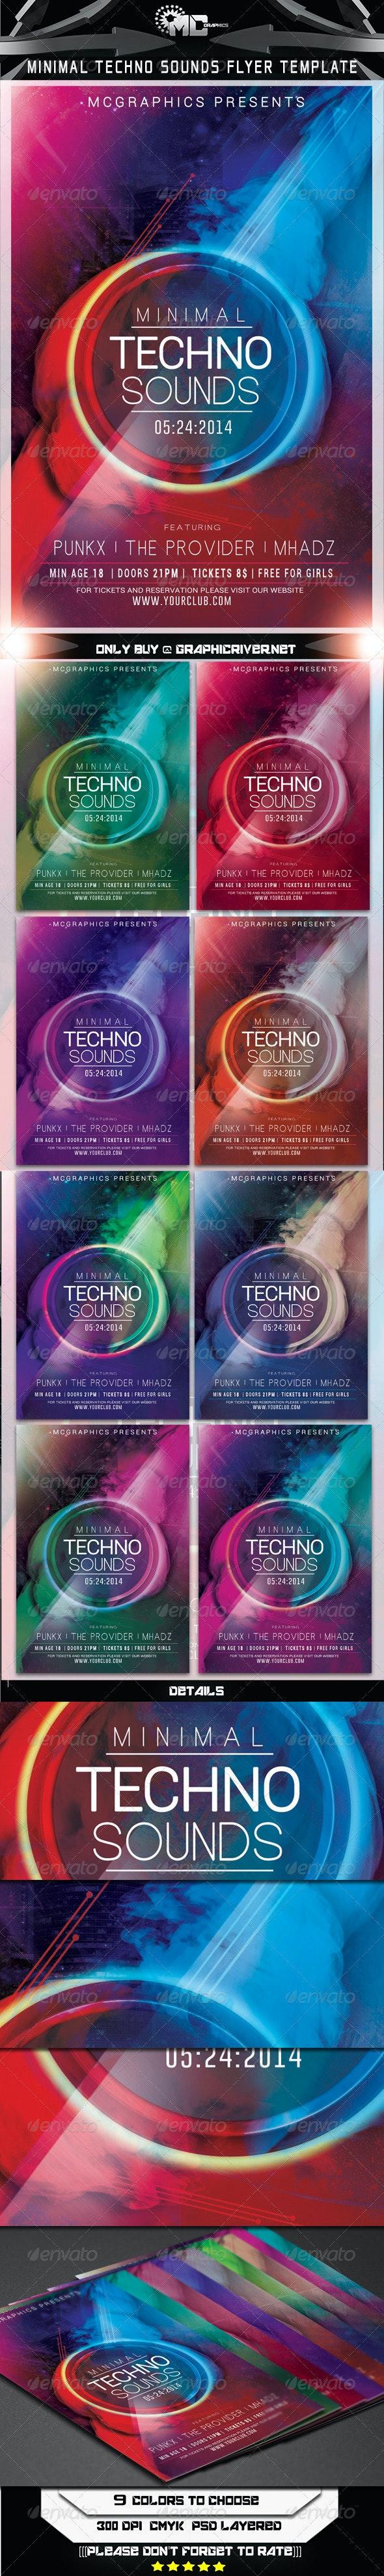 Minimal Techno Sounds Flyer Template - Flyers Print Templates